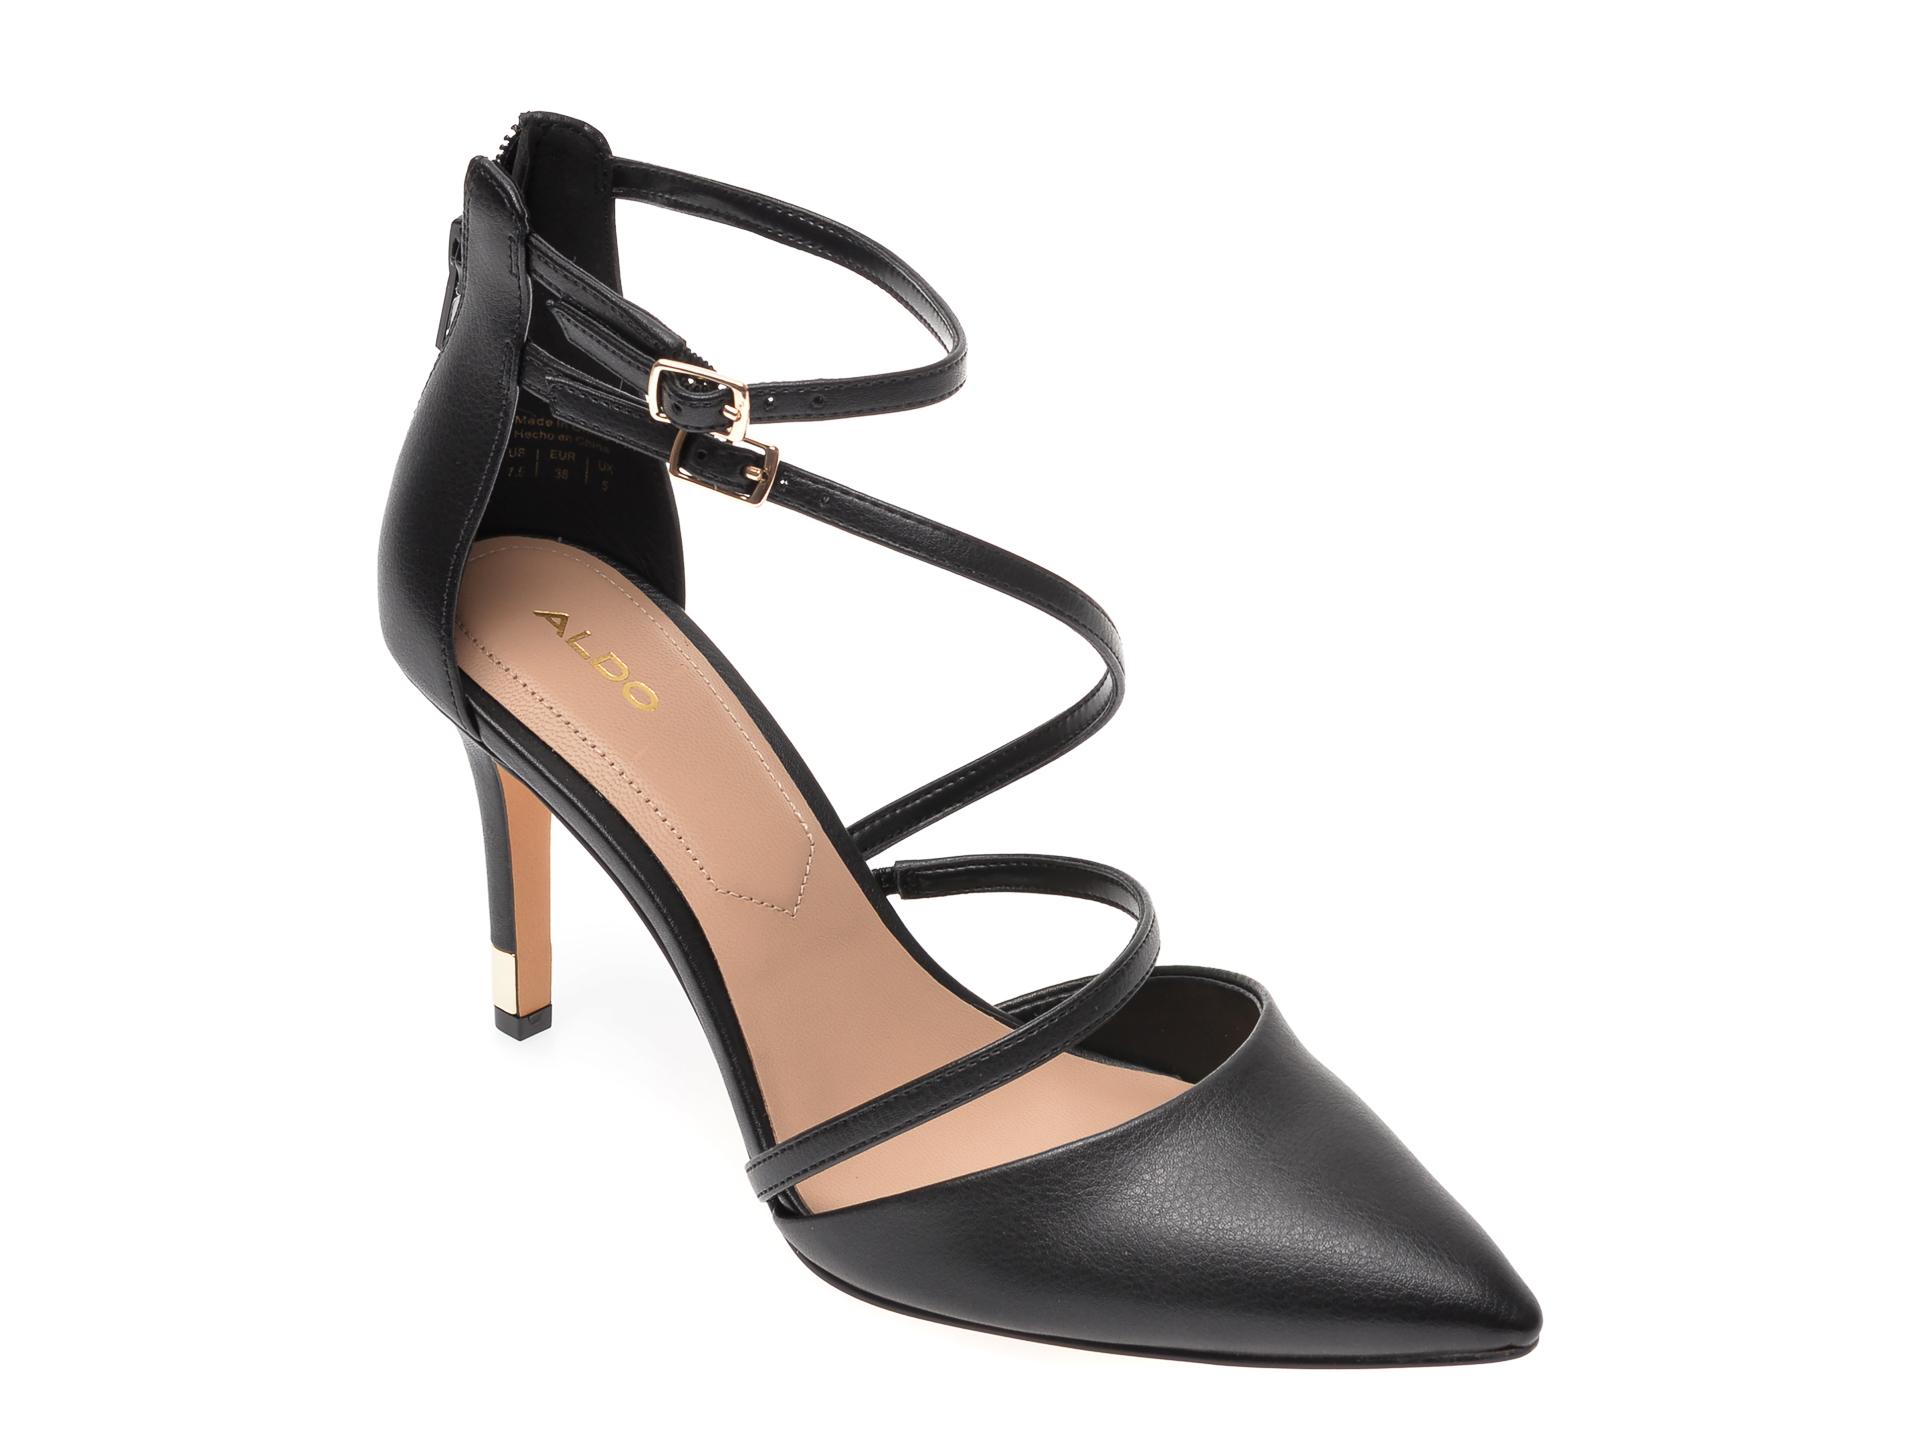 Pantofi ALDO negri, Torga001, din piele ecologica imagine otter.ro